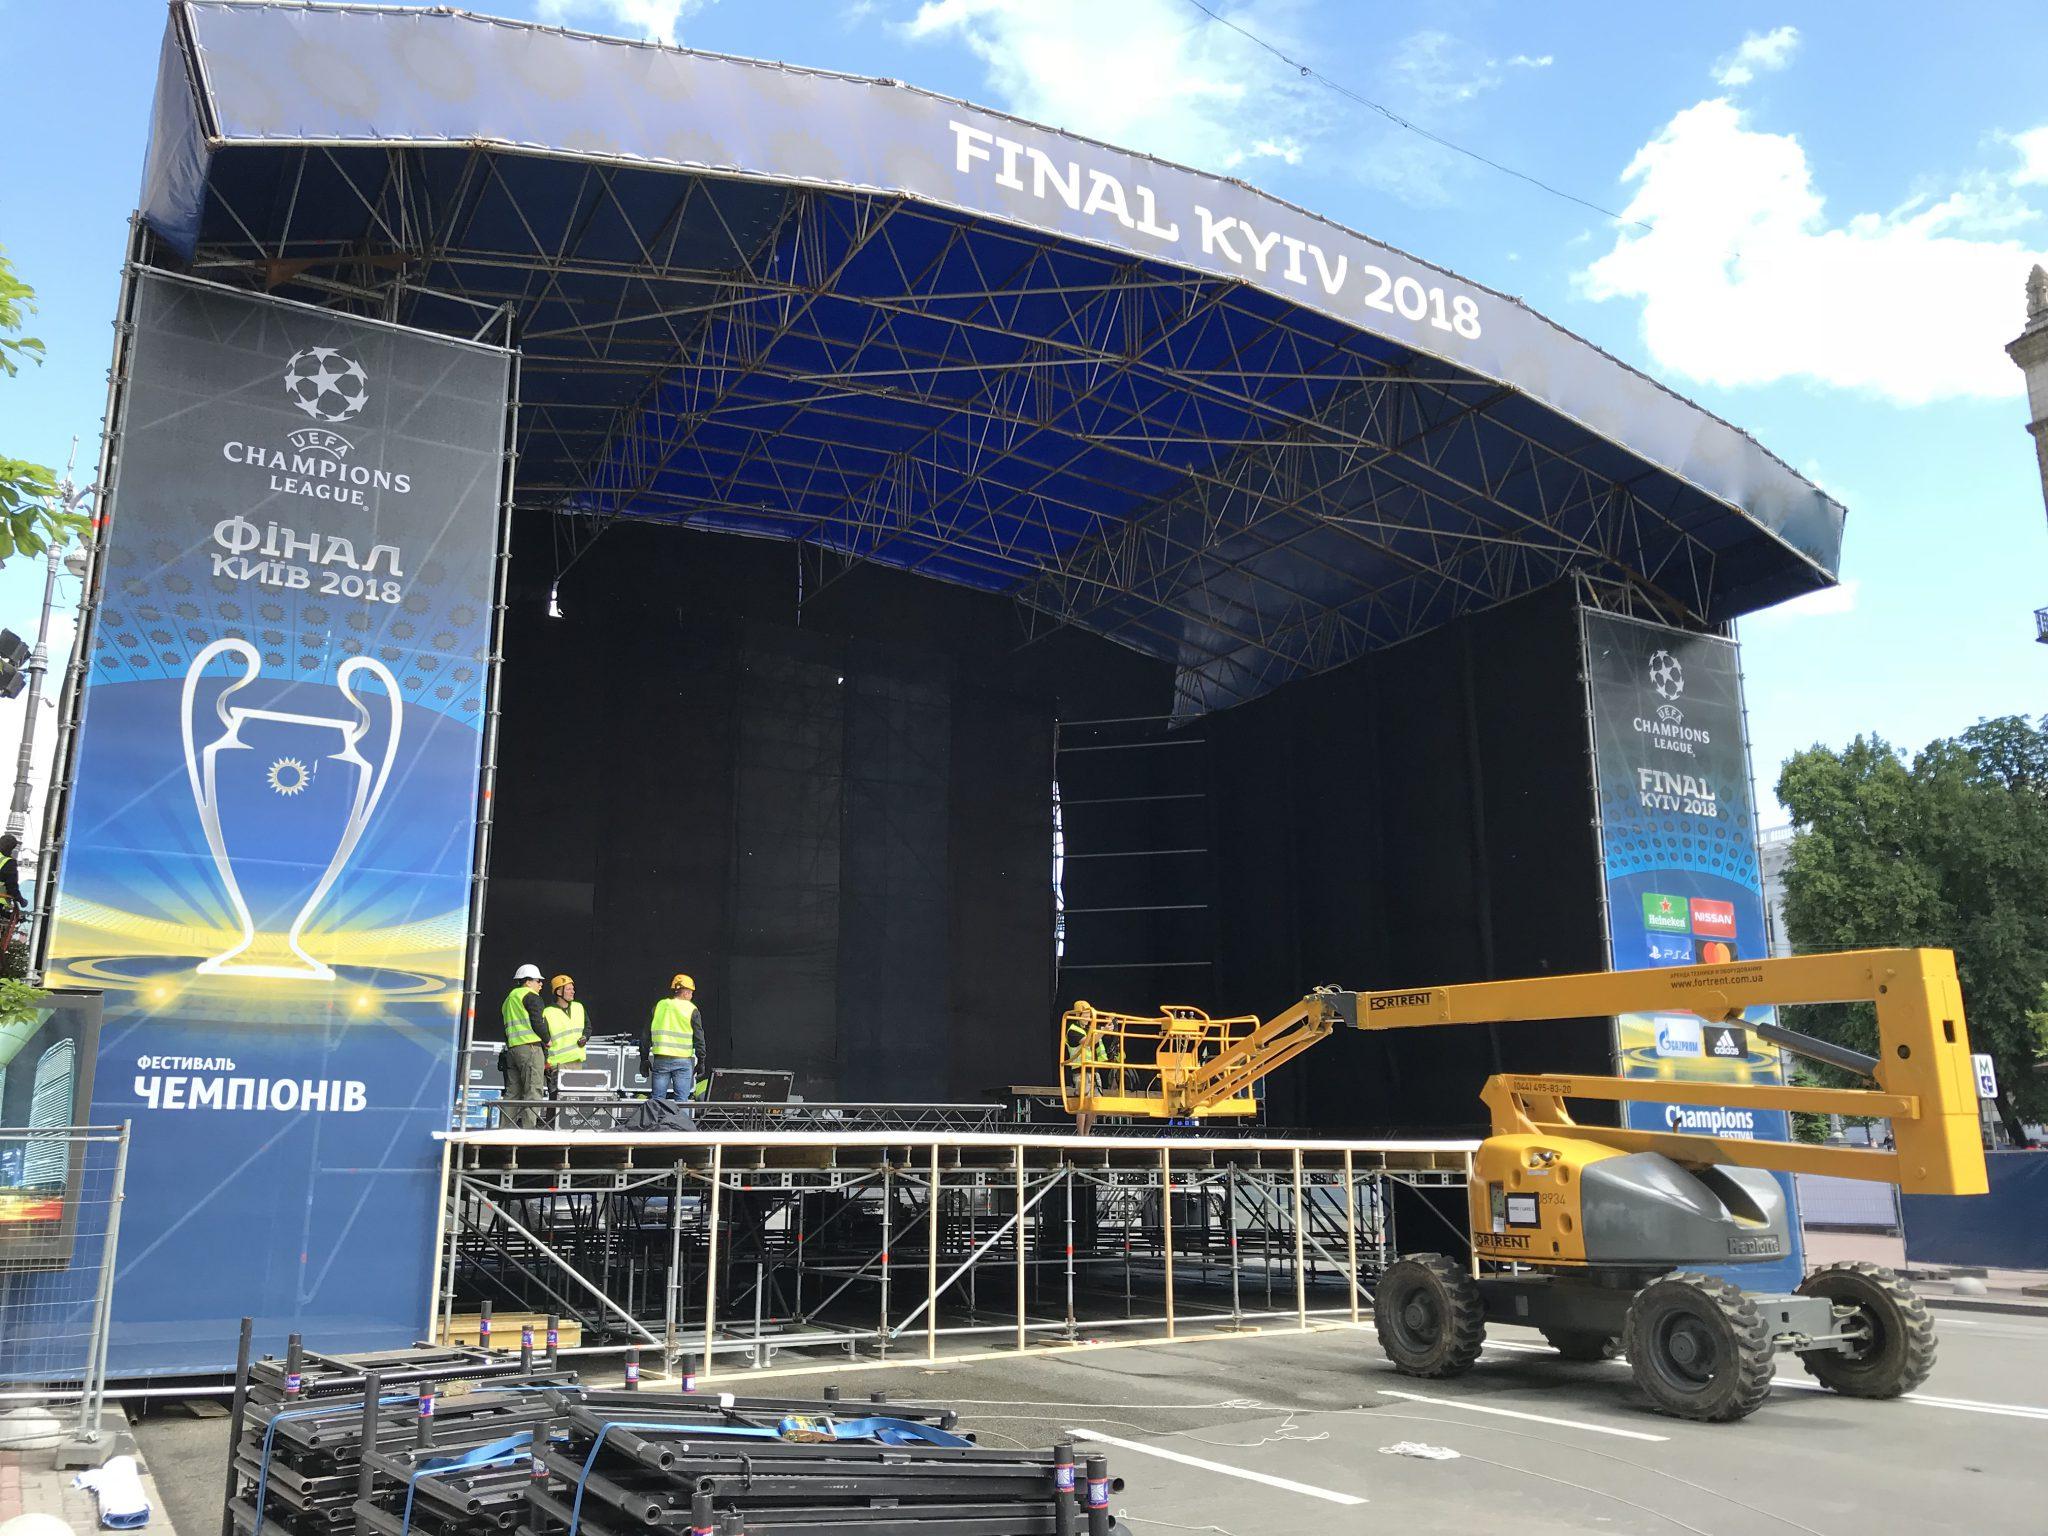 UEFA Champions Festival